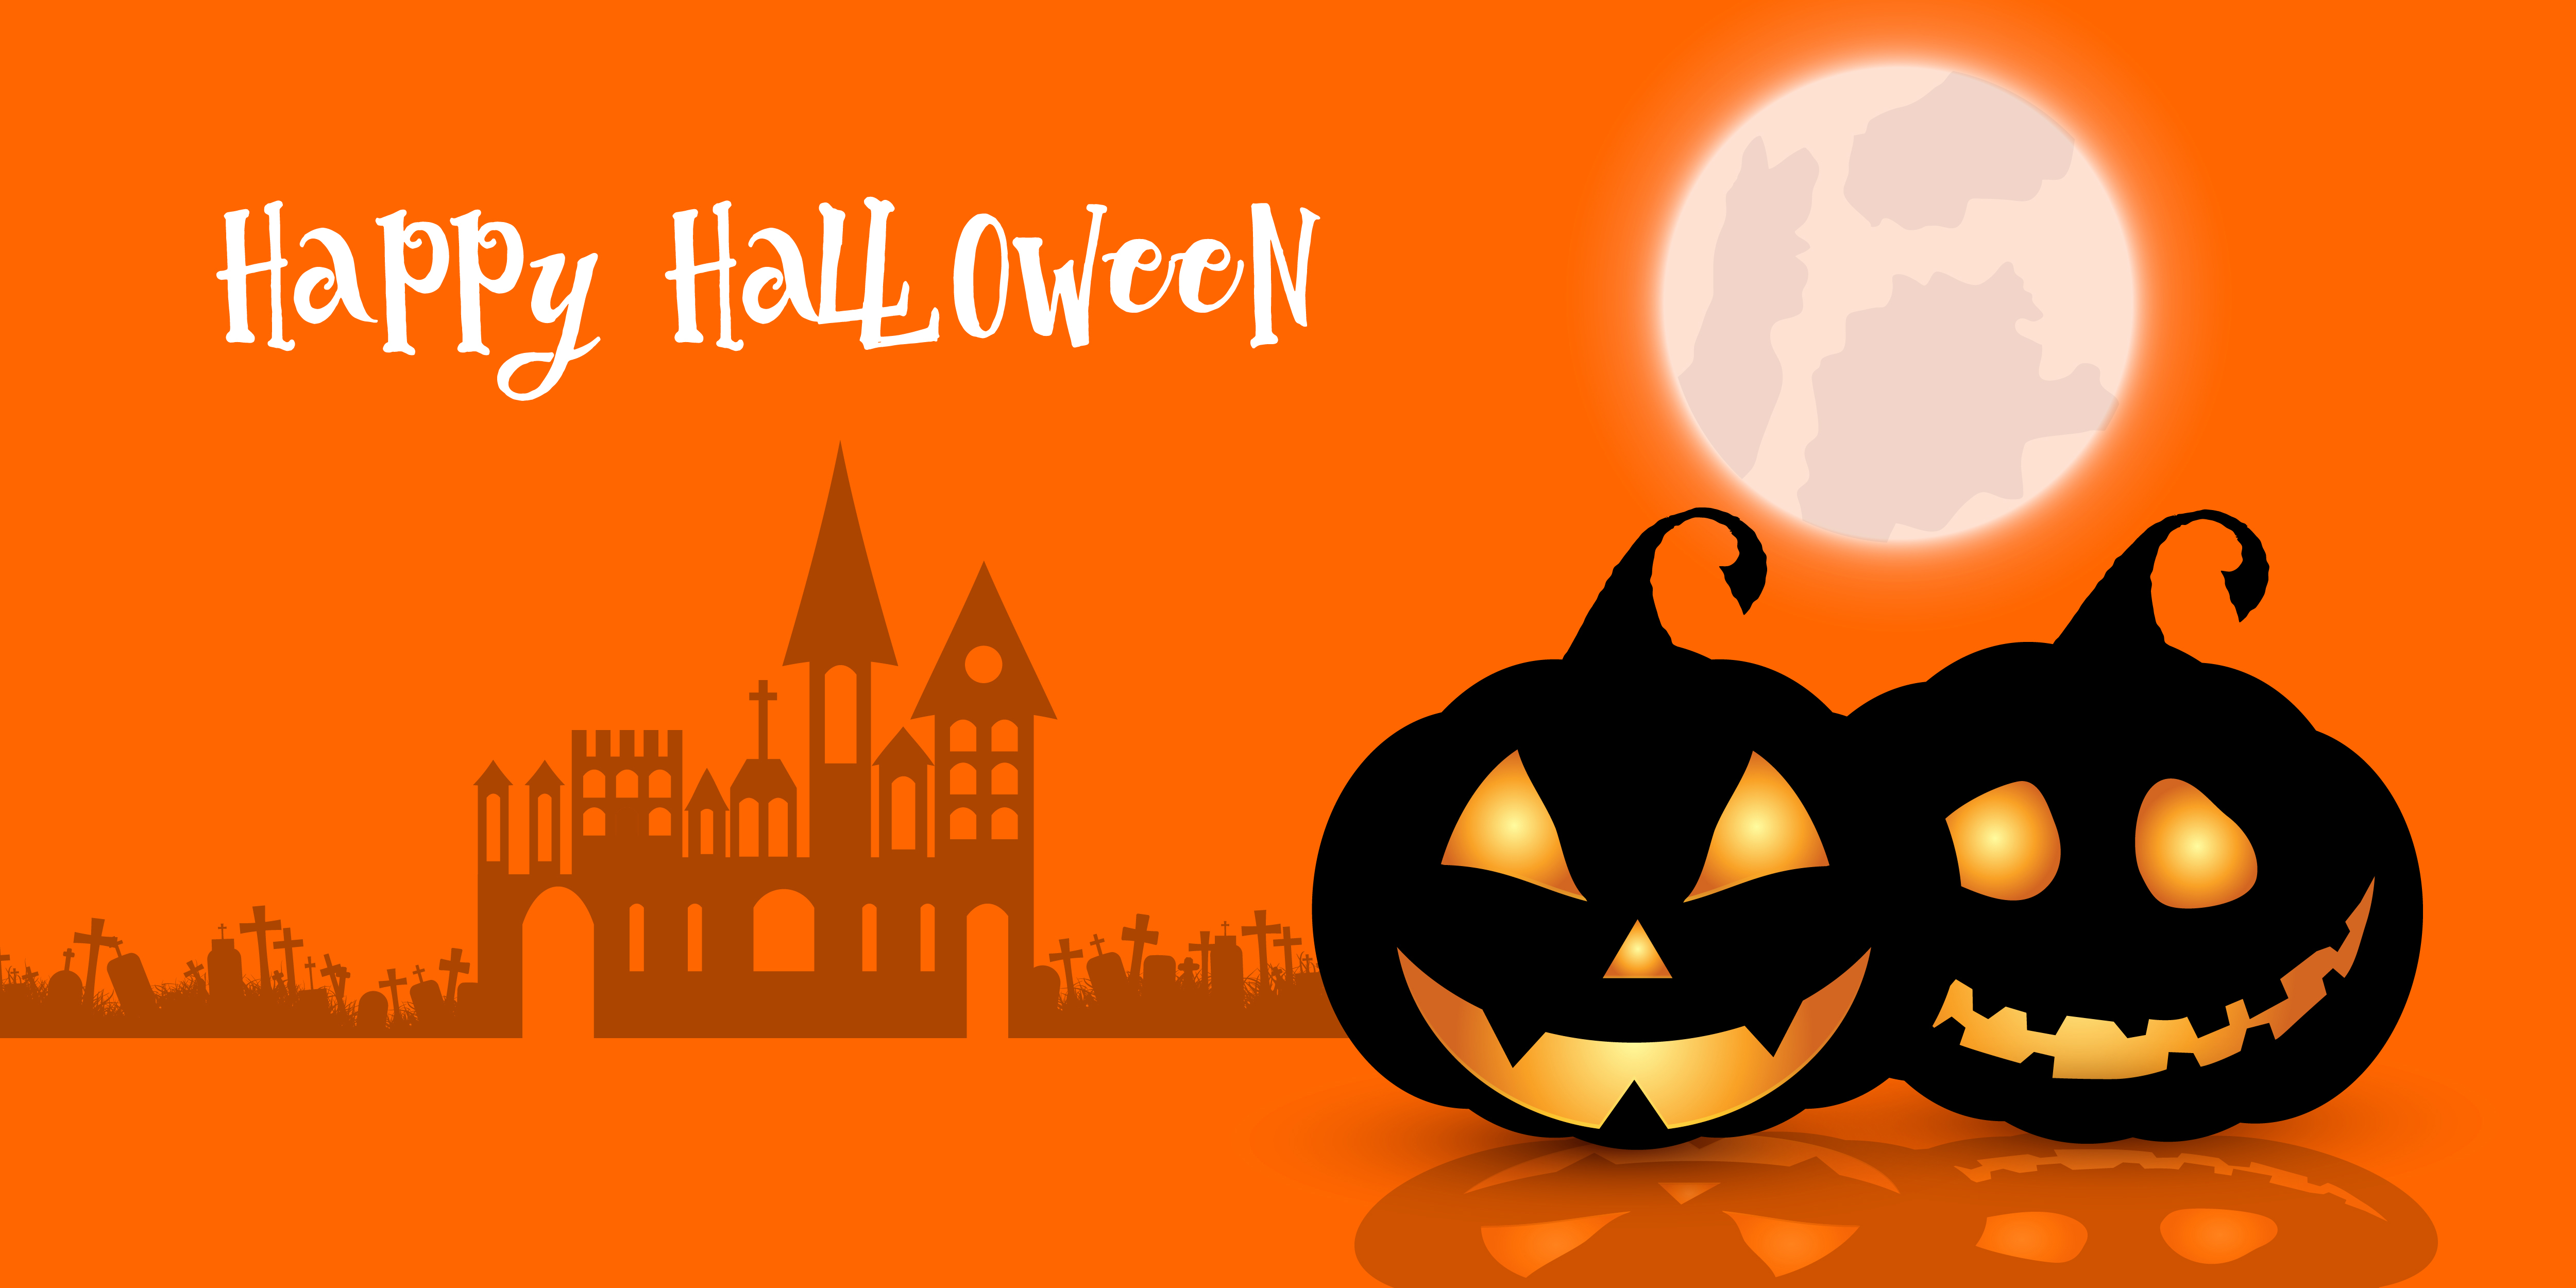 Happy Halloween Pumpkins And Spooky Haunted House Banner Download Free Vectors Clipart Graphics Vector Art